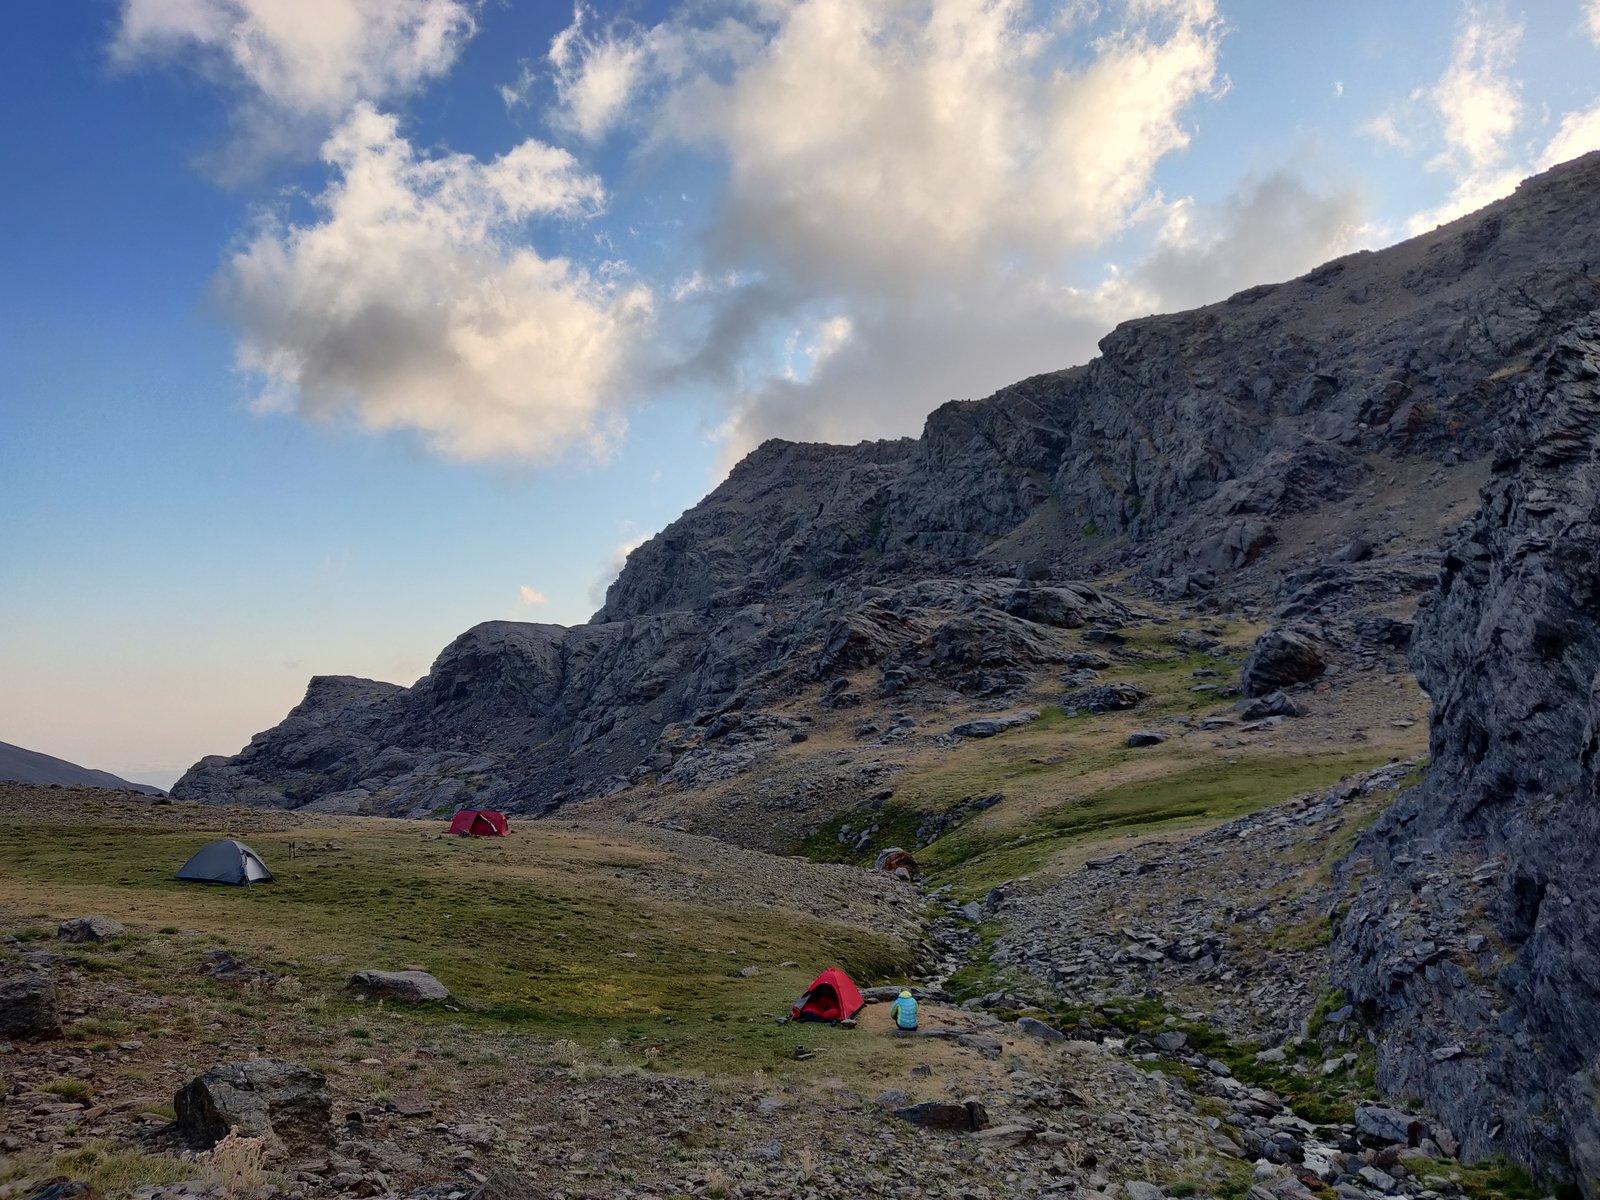 Overnight camping spot